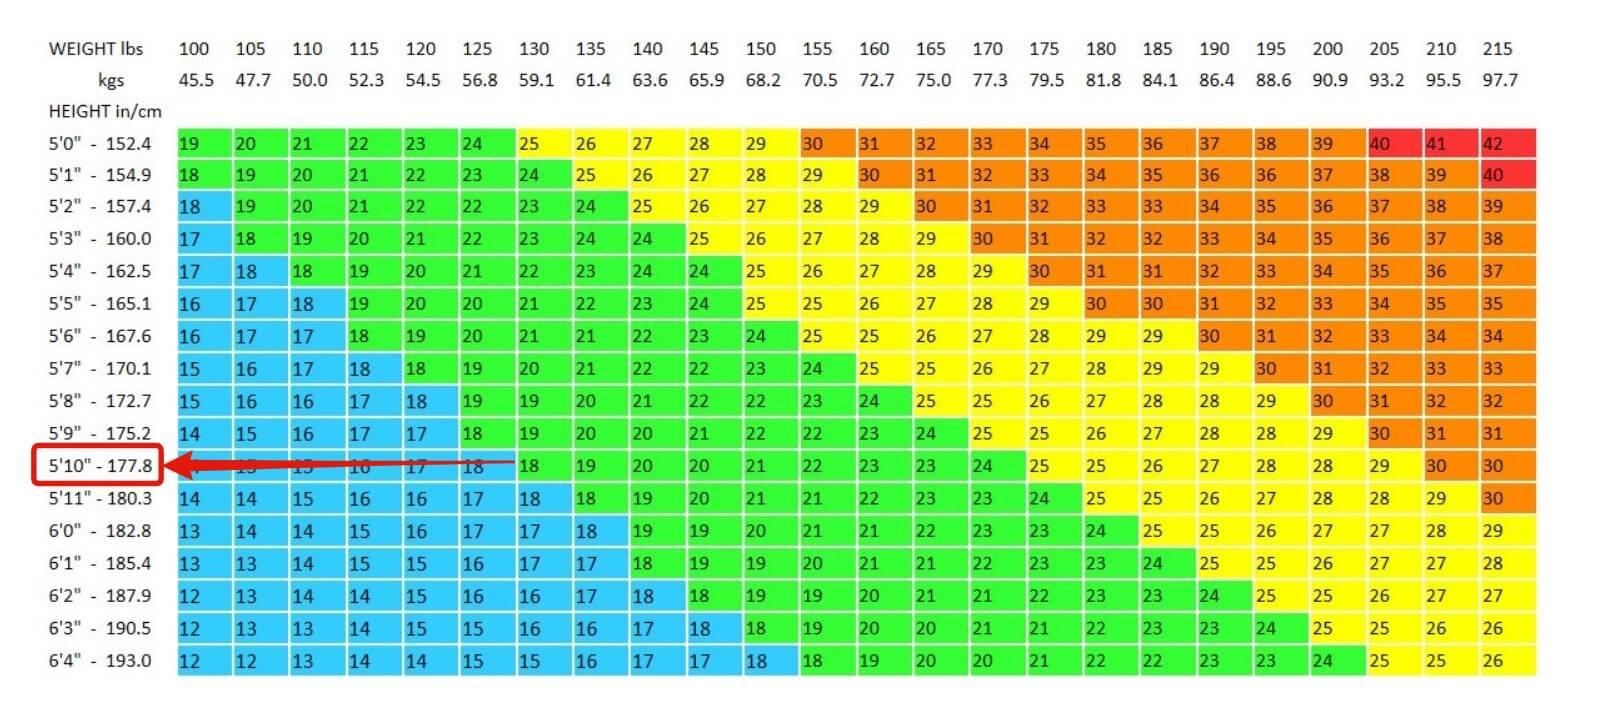 bmi chart for men